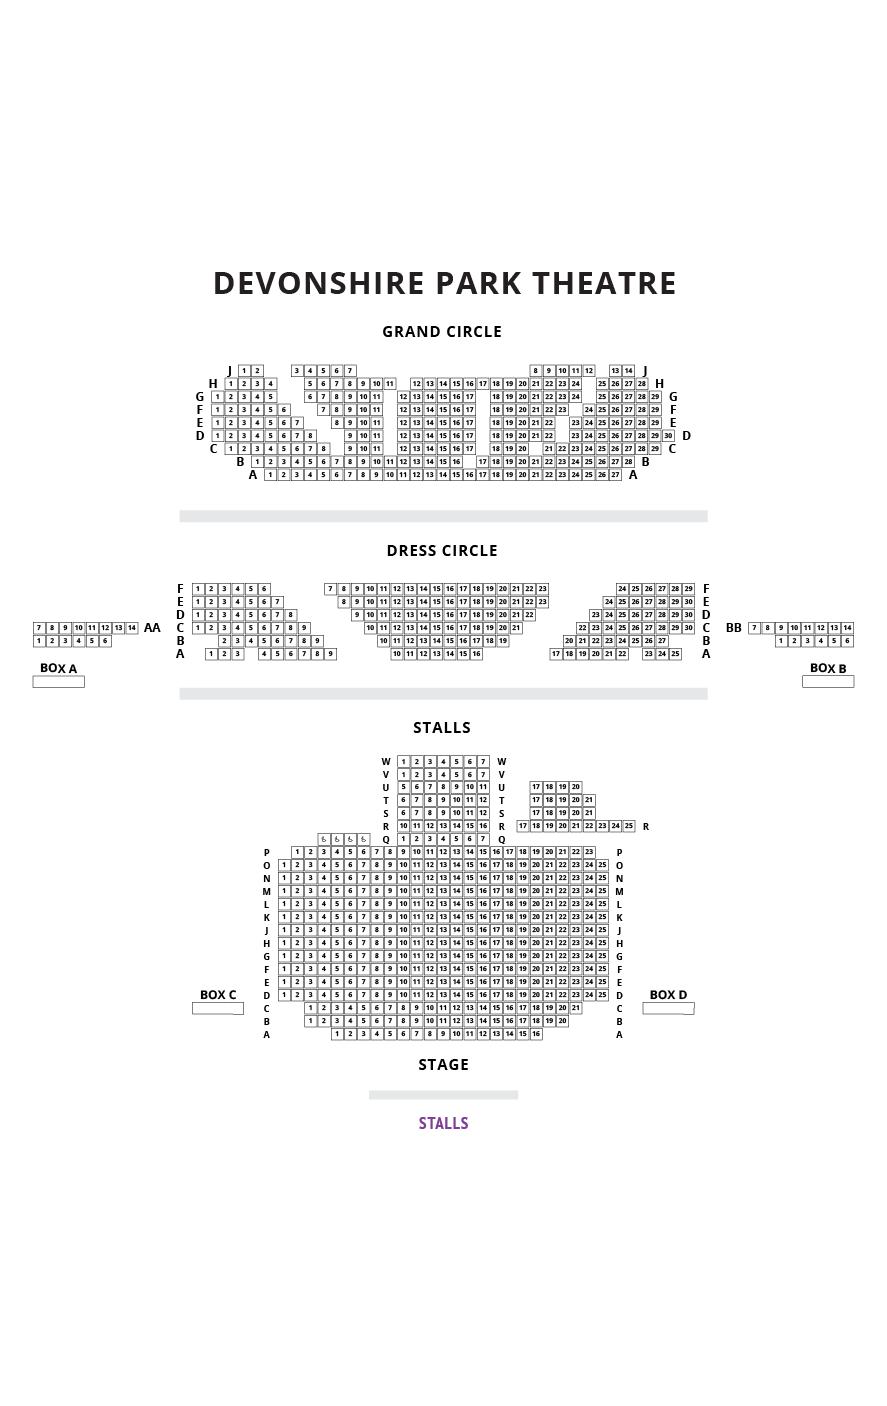 Devonshire Park Theatre Seating Plan